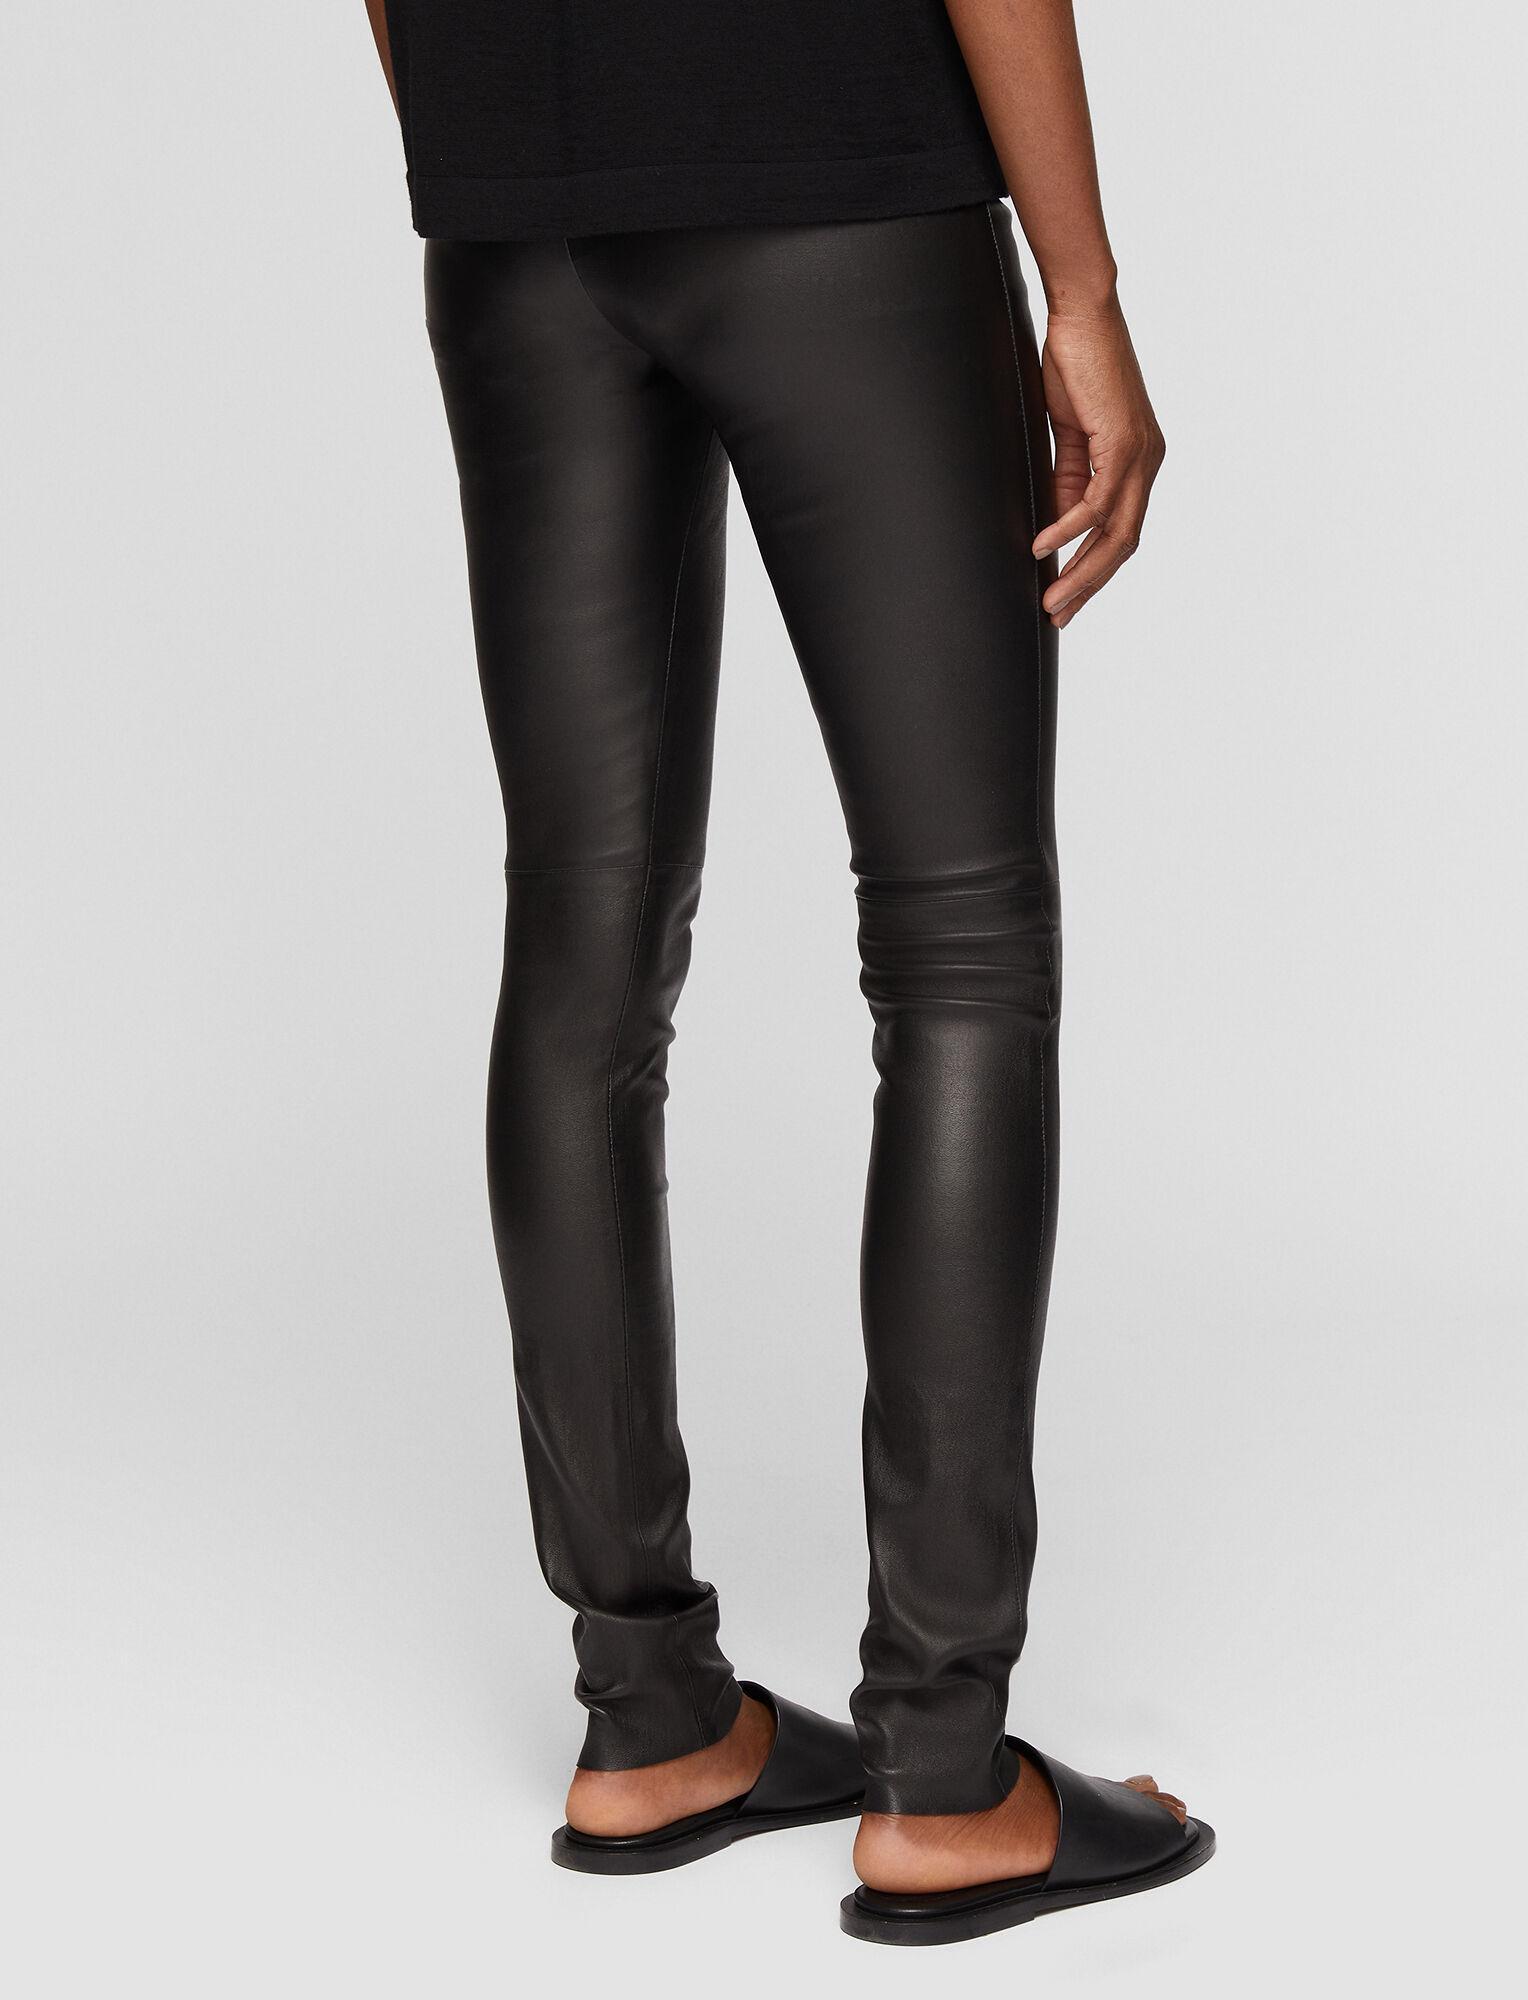 Joseph, Leather Stretch Leggings, in BLACK